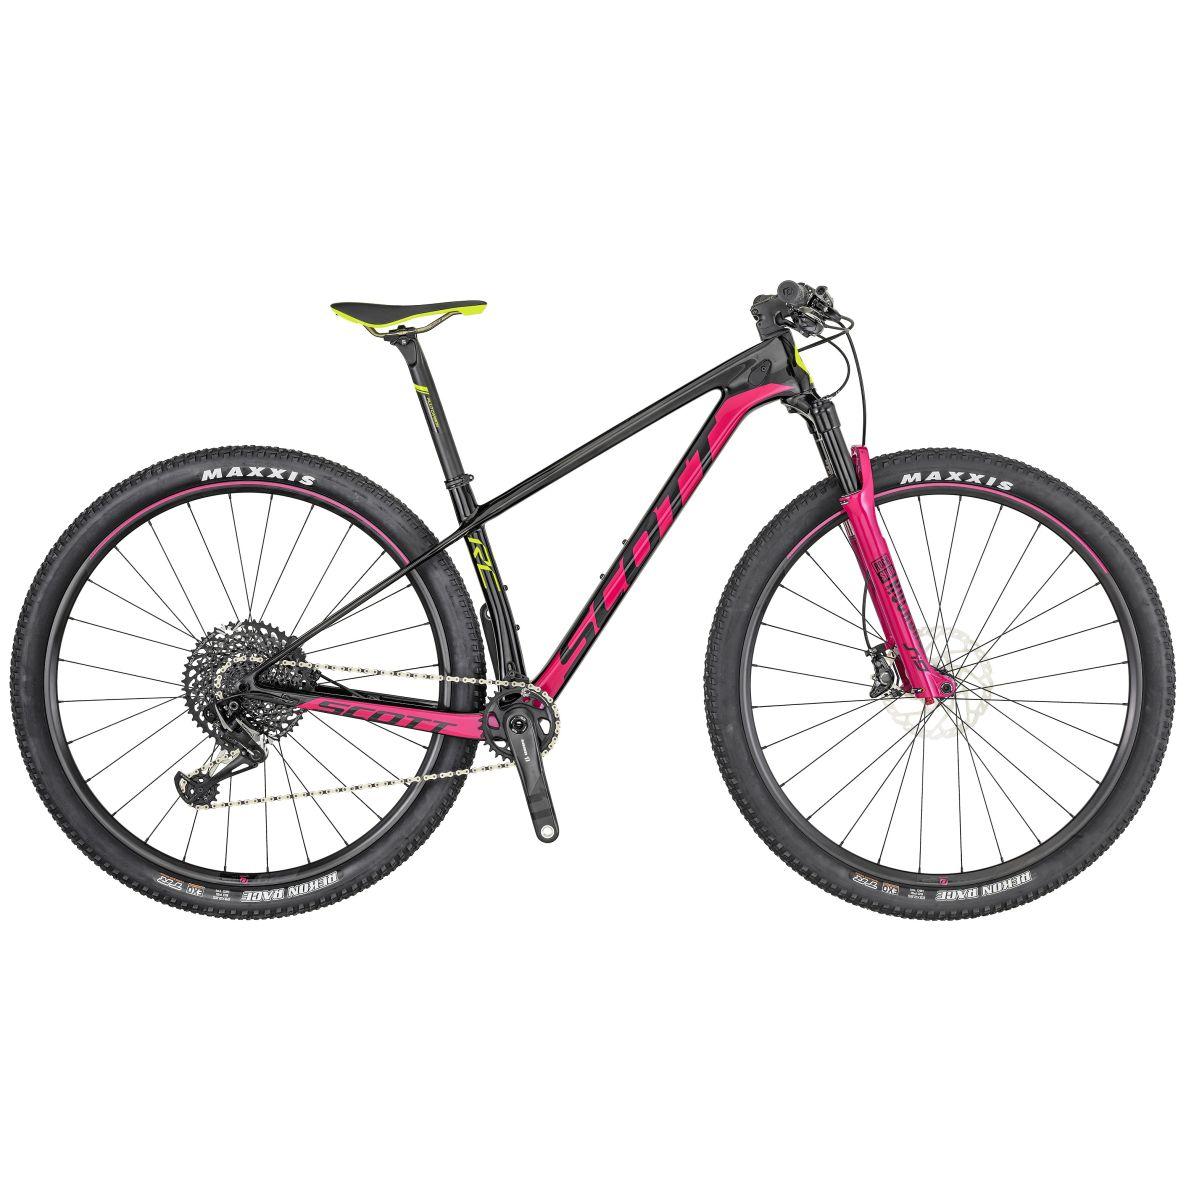 scott contessa scale rc 900 29 39 39 damen carbon mtb fahrrad. Black Bedroom Furniture Sets. Home Design Ideas